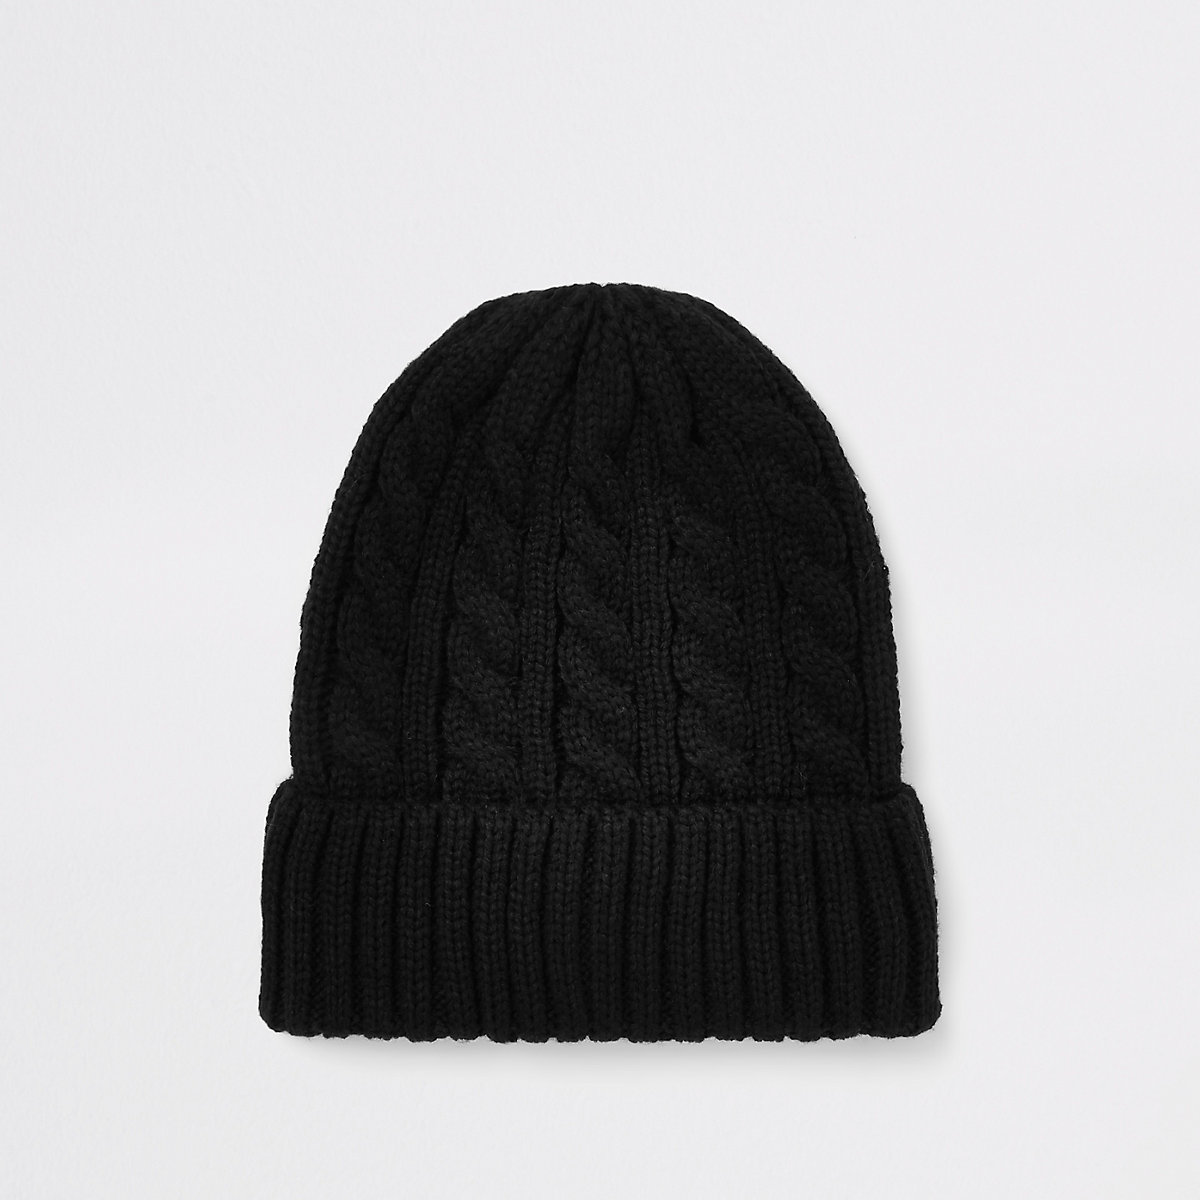 Black cable knit fisherman beanie hat - Hats   Caps - Accessories - men a6f90d728a9